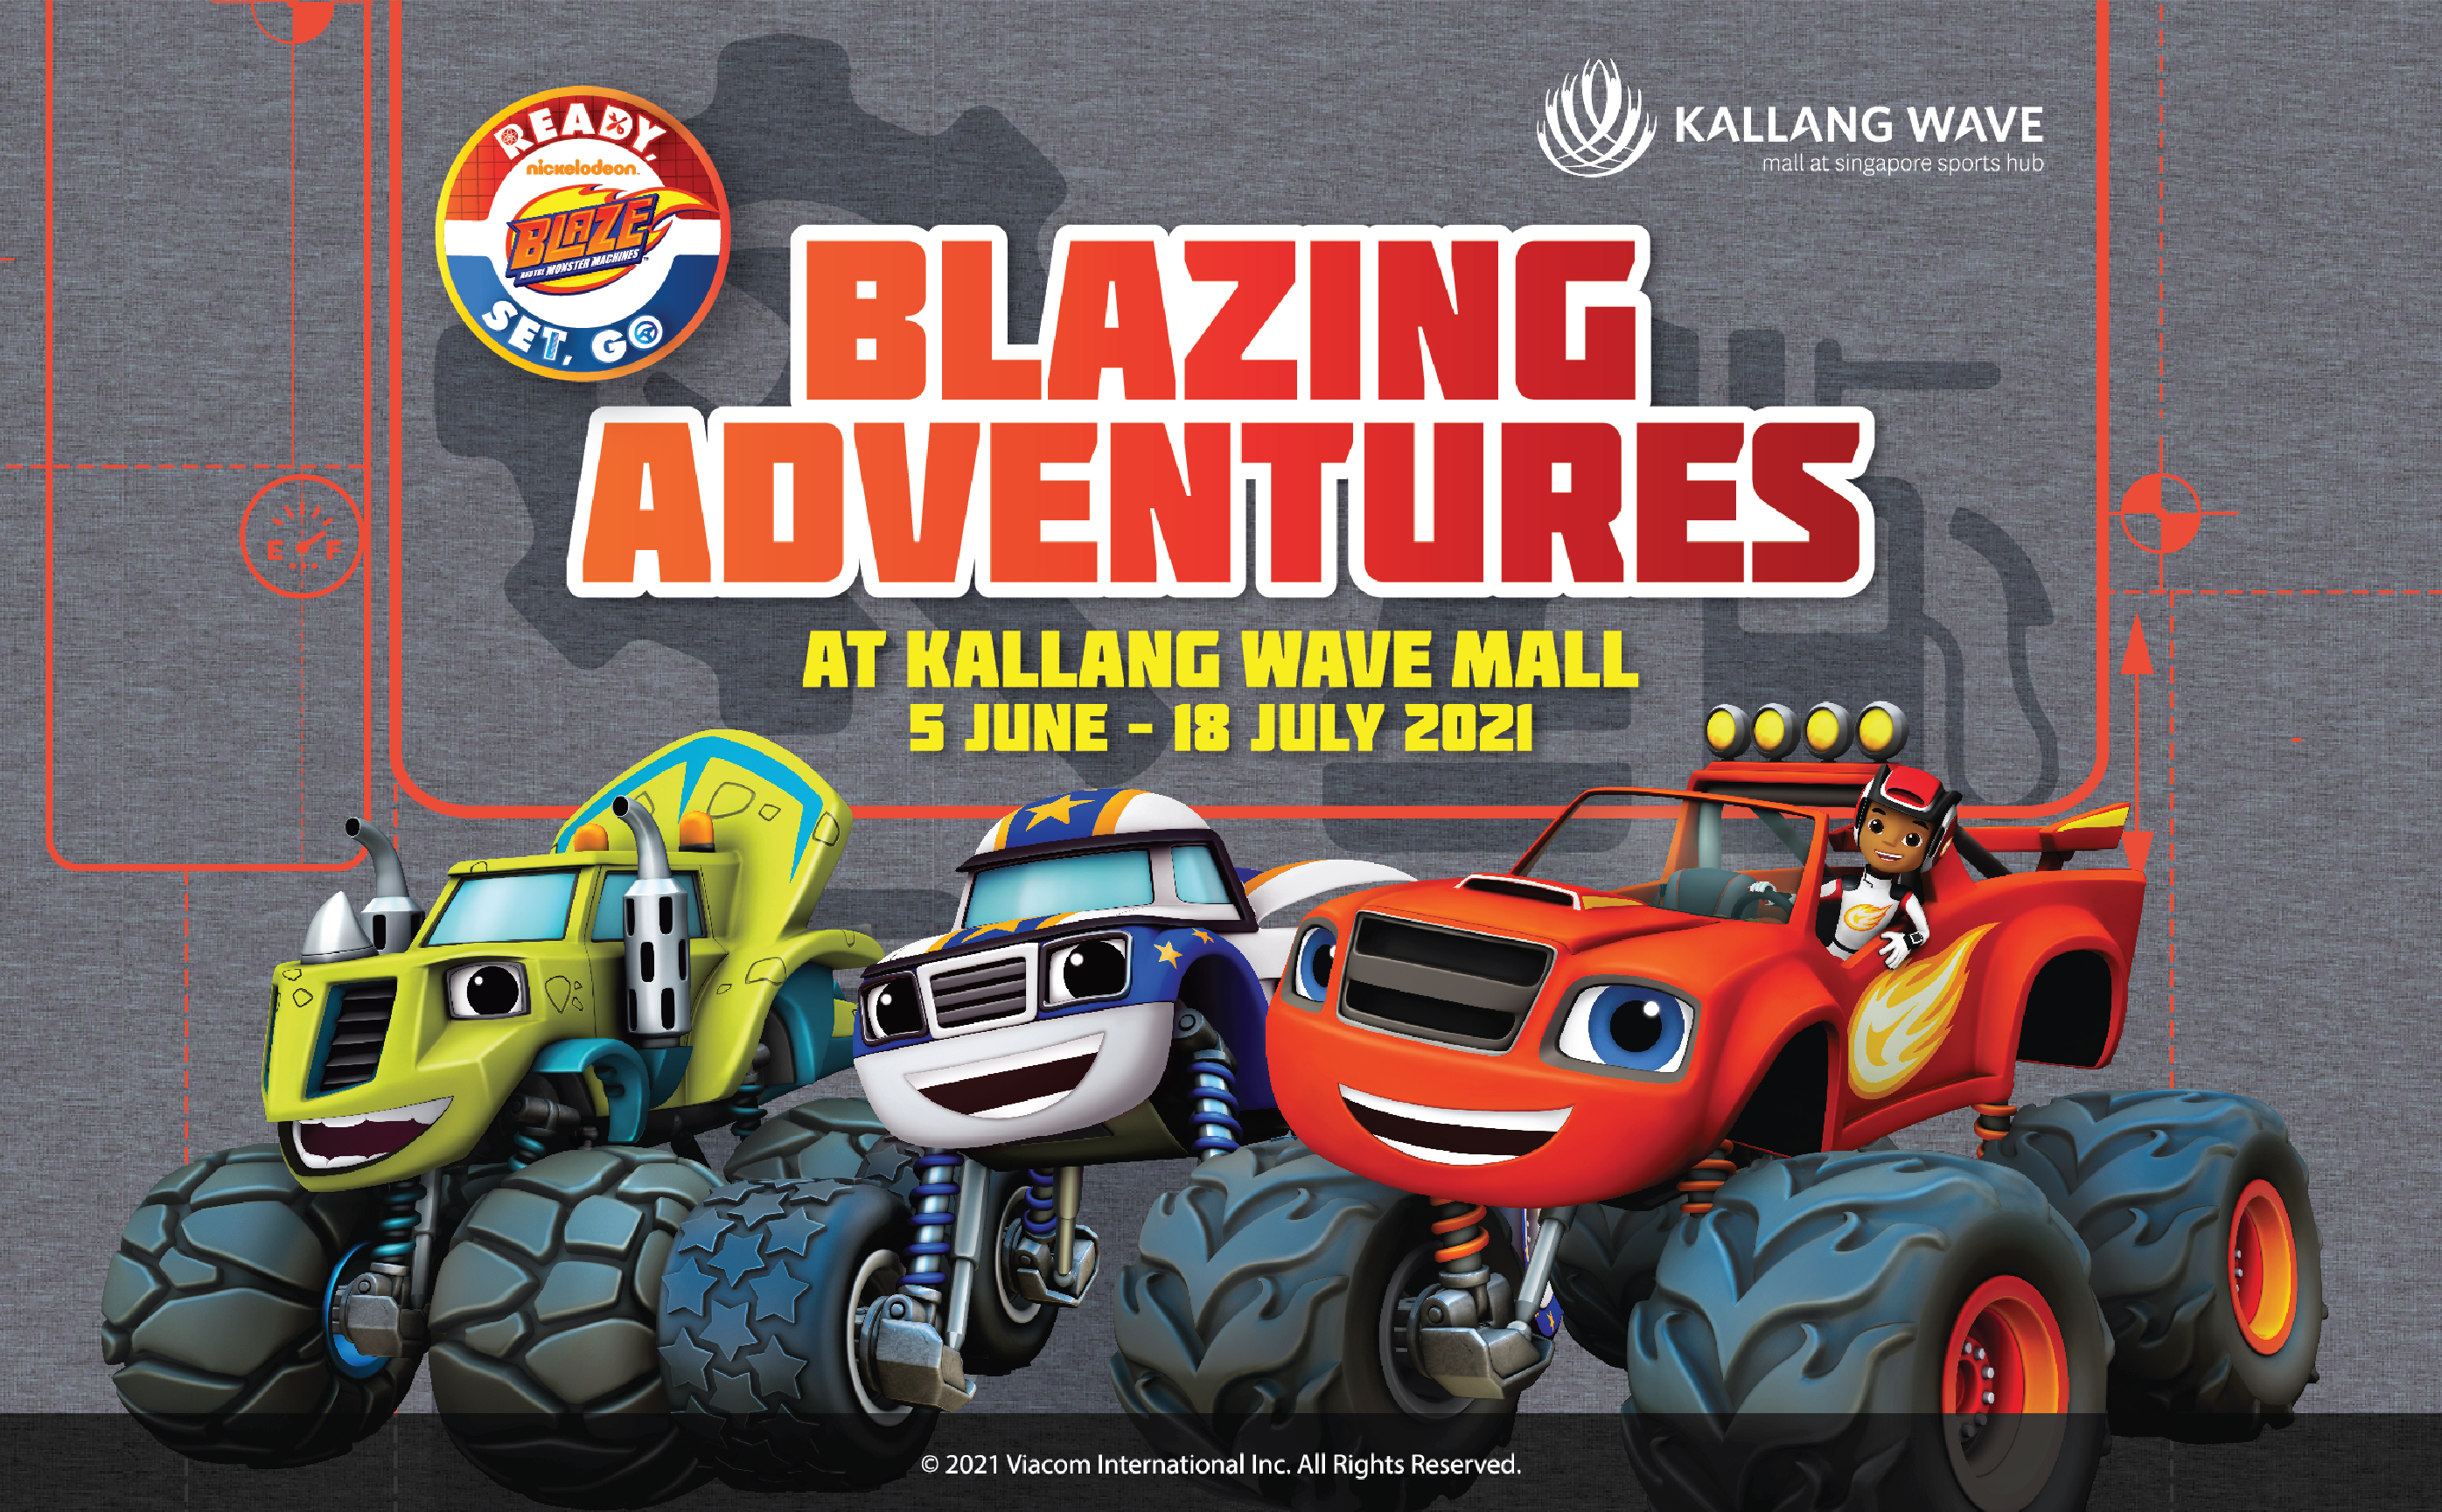 Blazing Adventures At Kallang Wave Mall